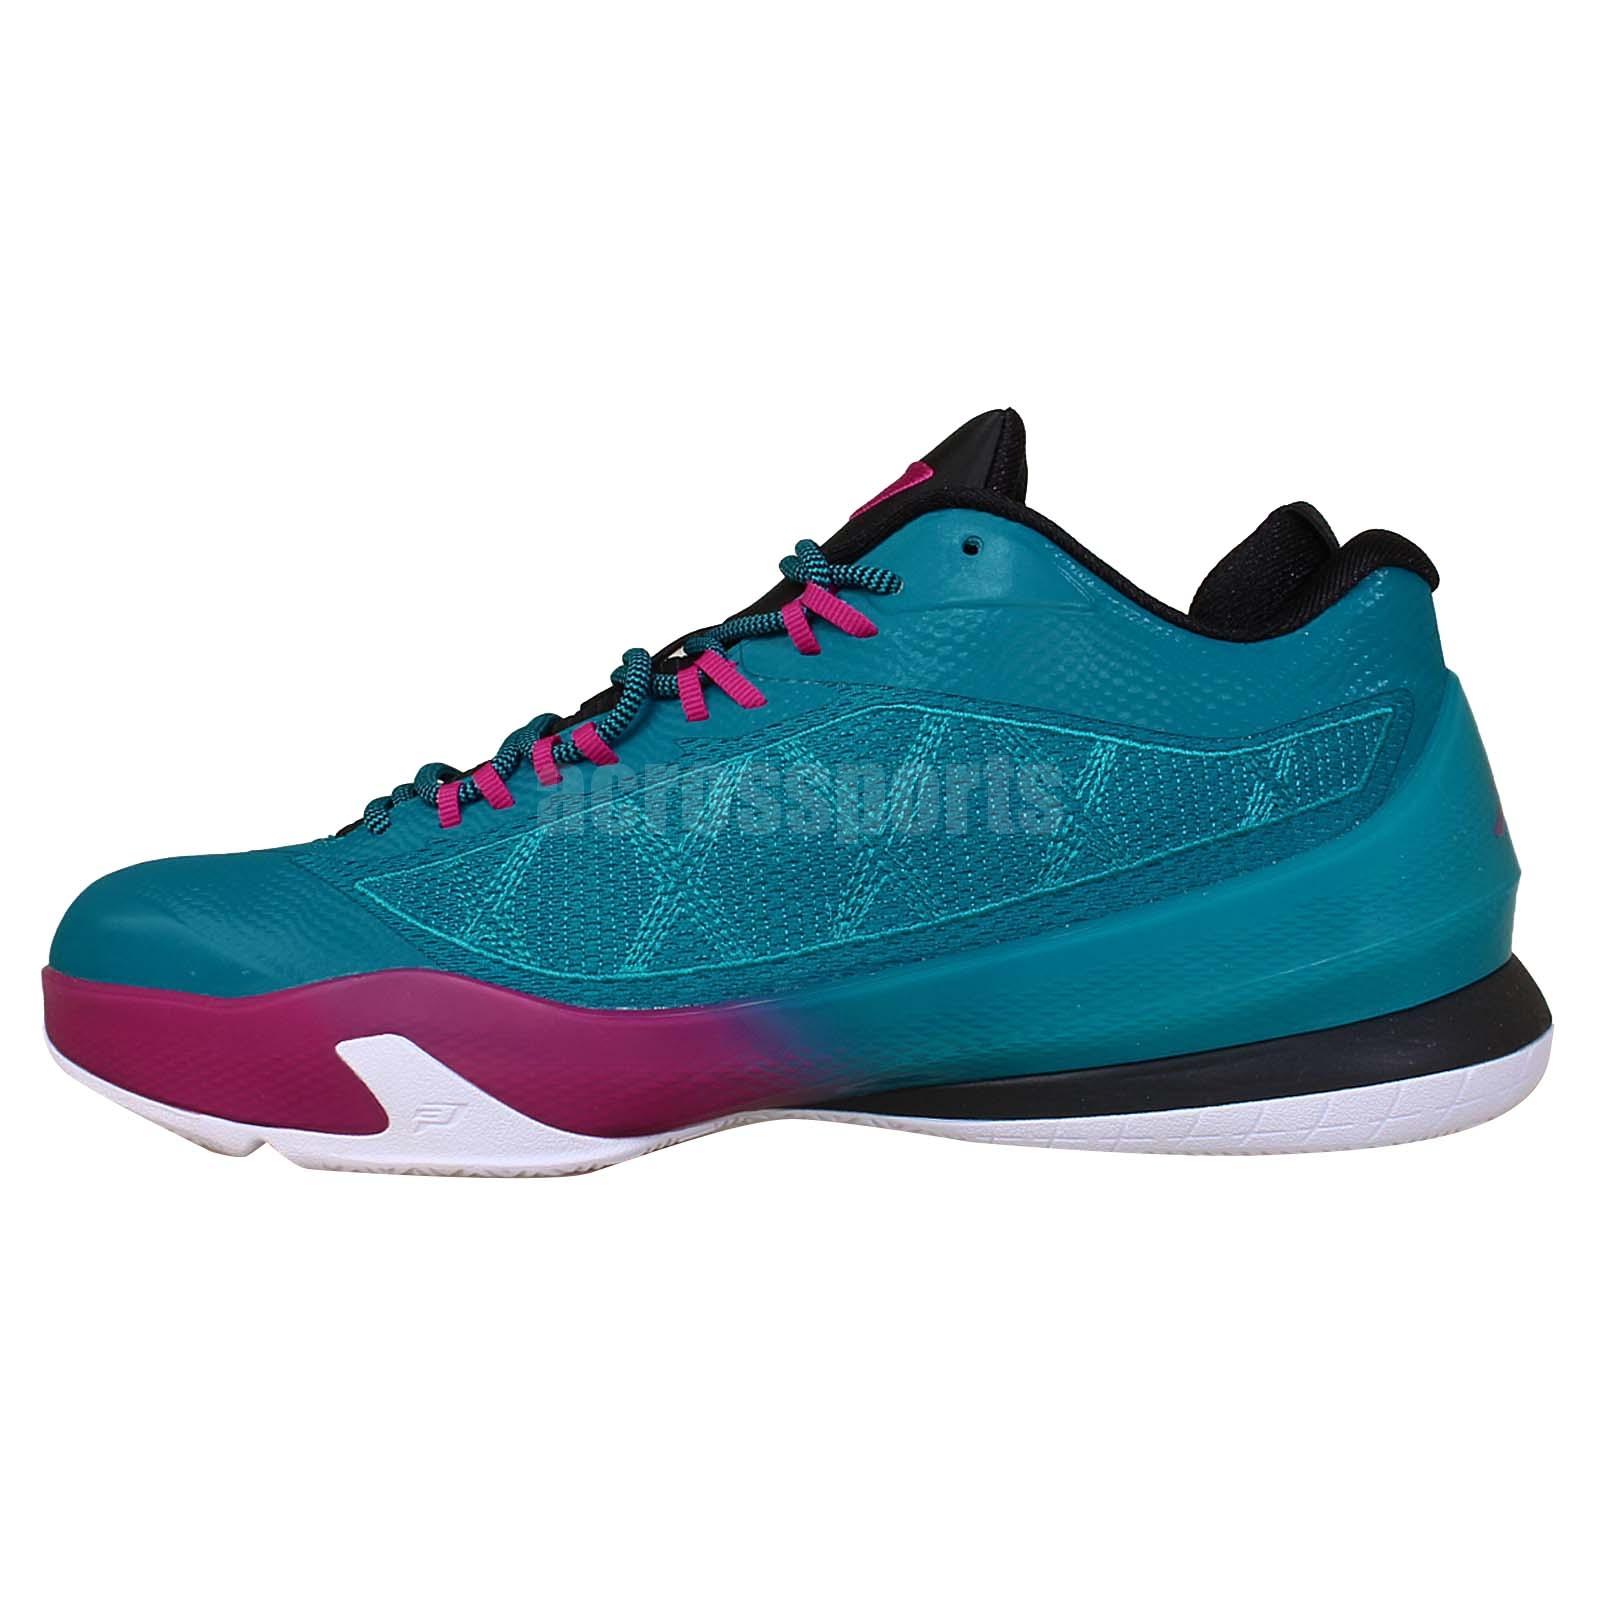 Nike Jordan CP3 VIII X 8 Chris Paul Teal Purple 2014 New ...